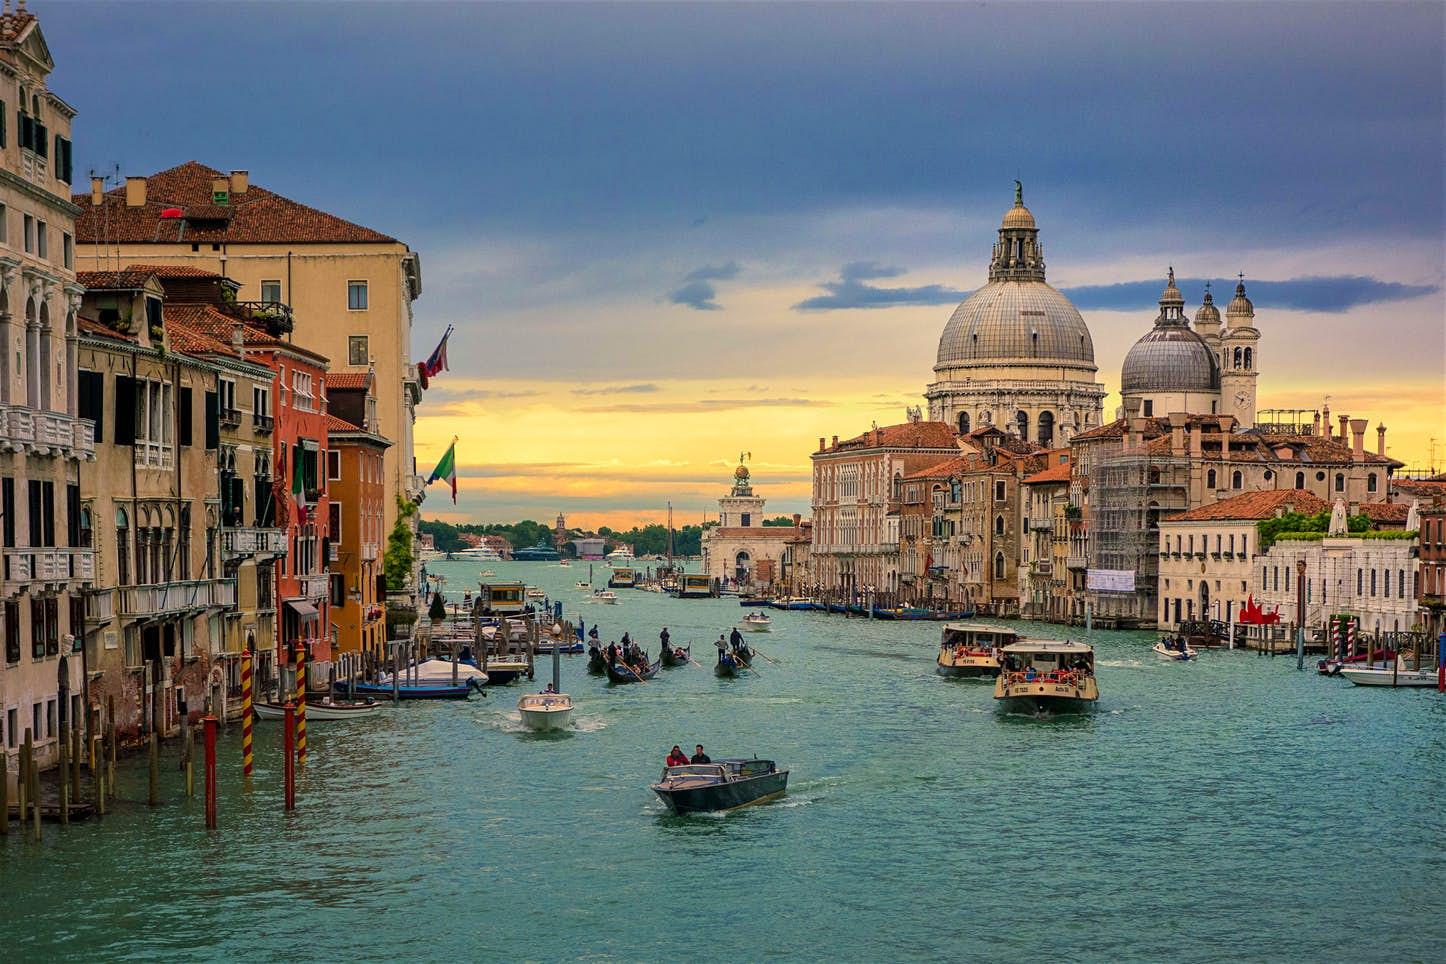 إيطالياأفضل بلد سياحي عائلي